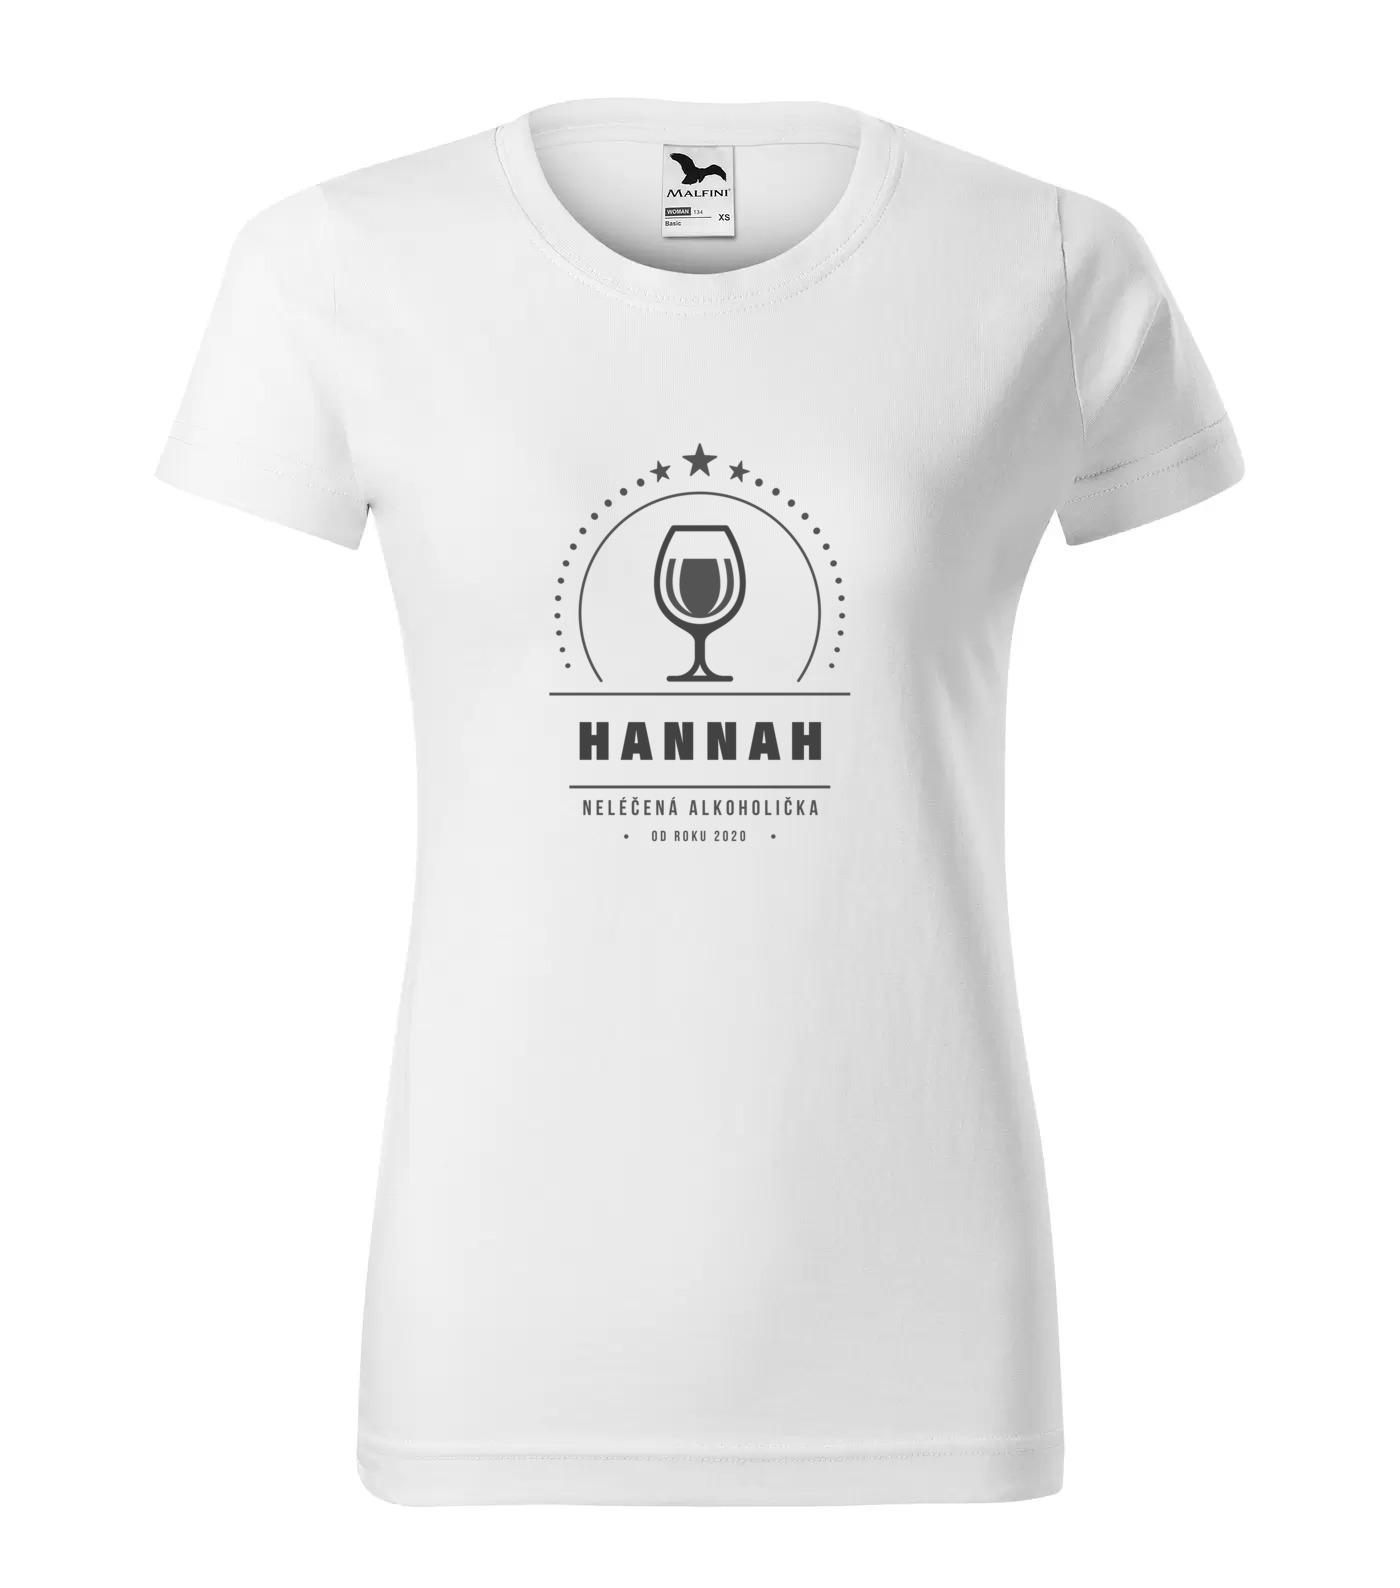 Tričko Alkoholička Hannah